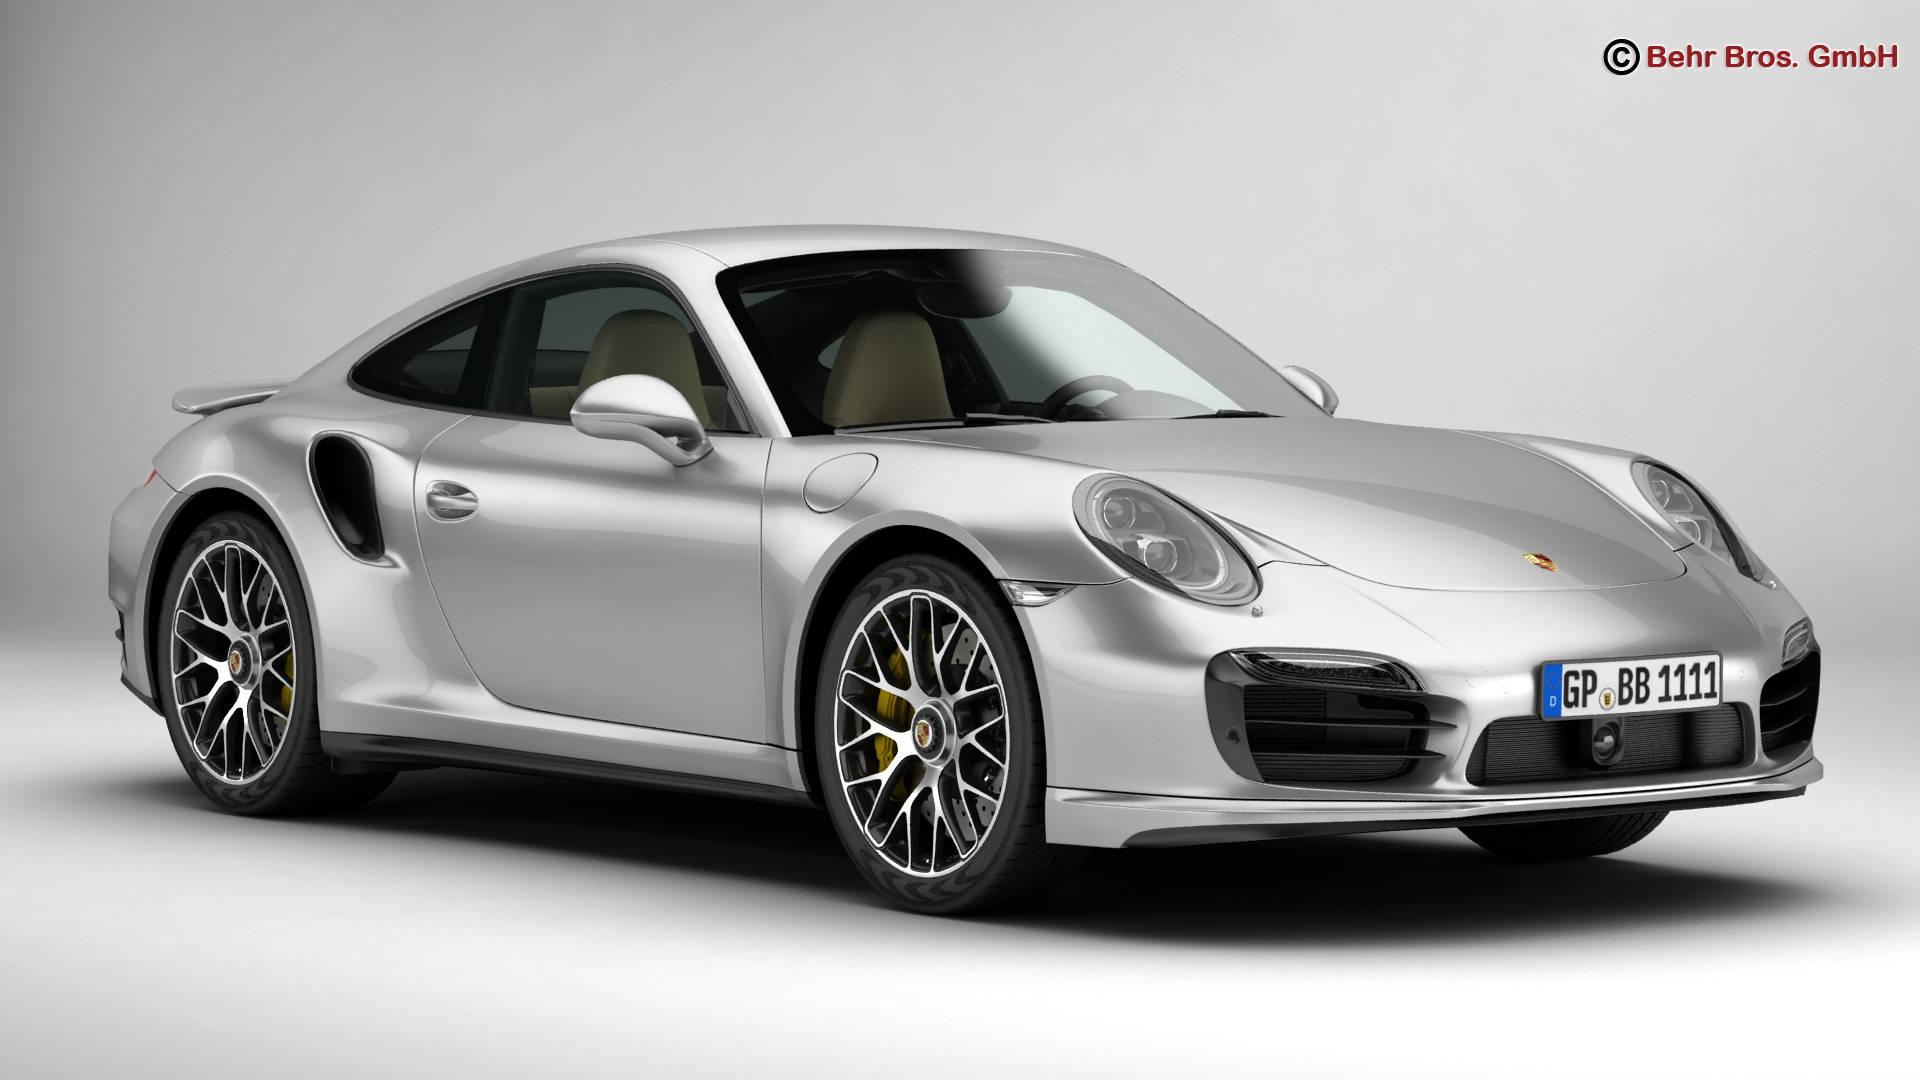 porsche 911 turbo s 2014 3d model 3ds max fbx c4d lwo ma mb obj 212476